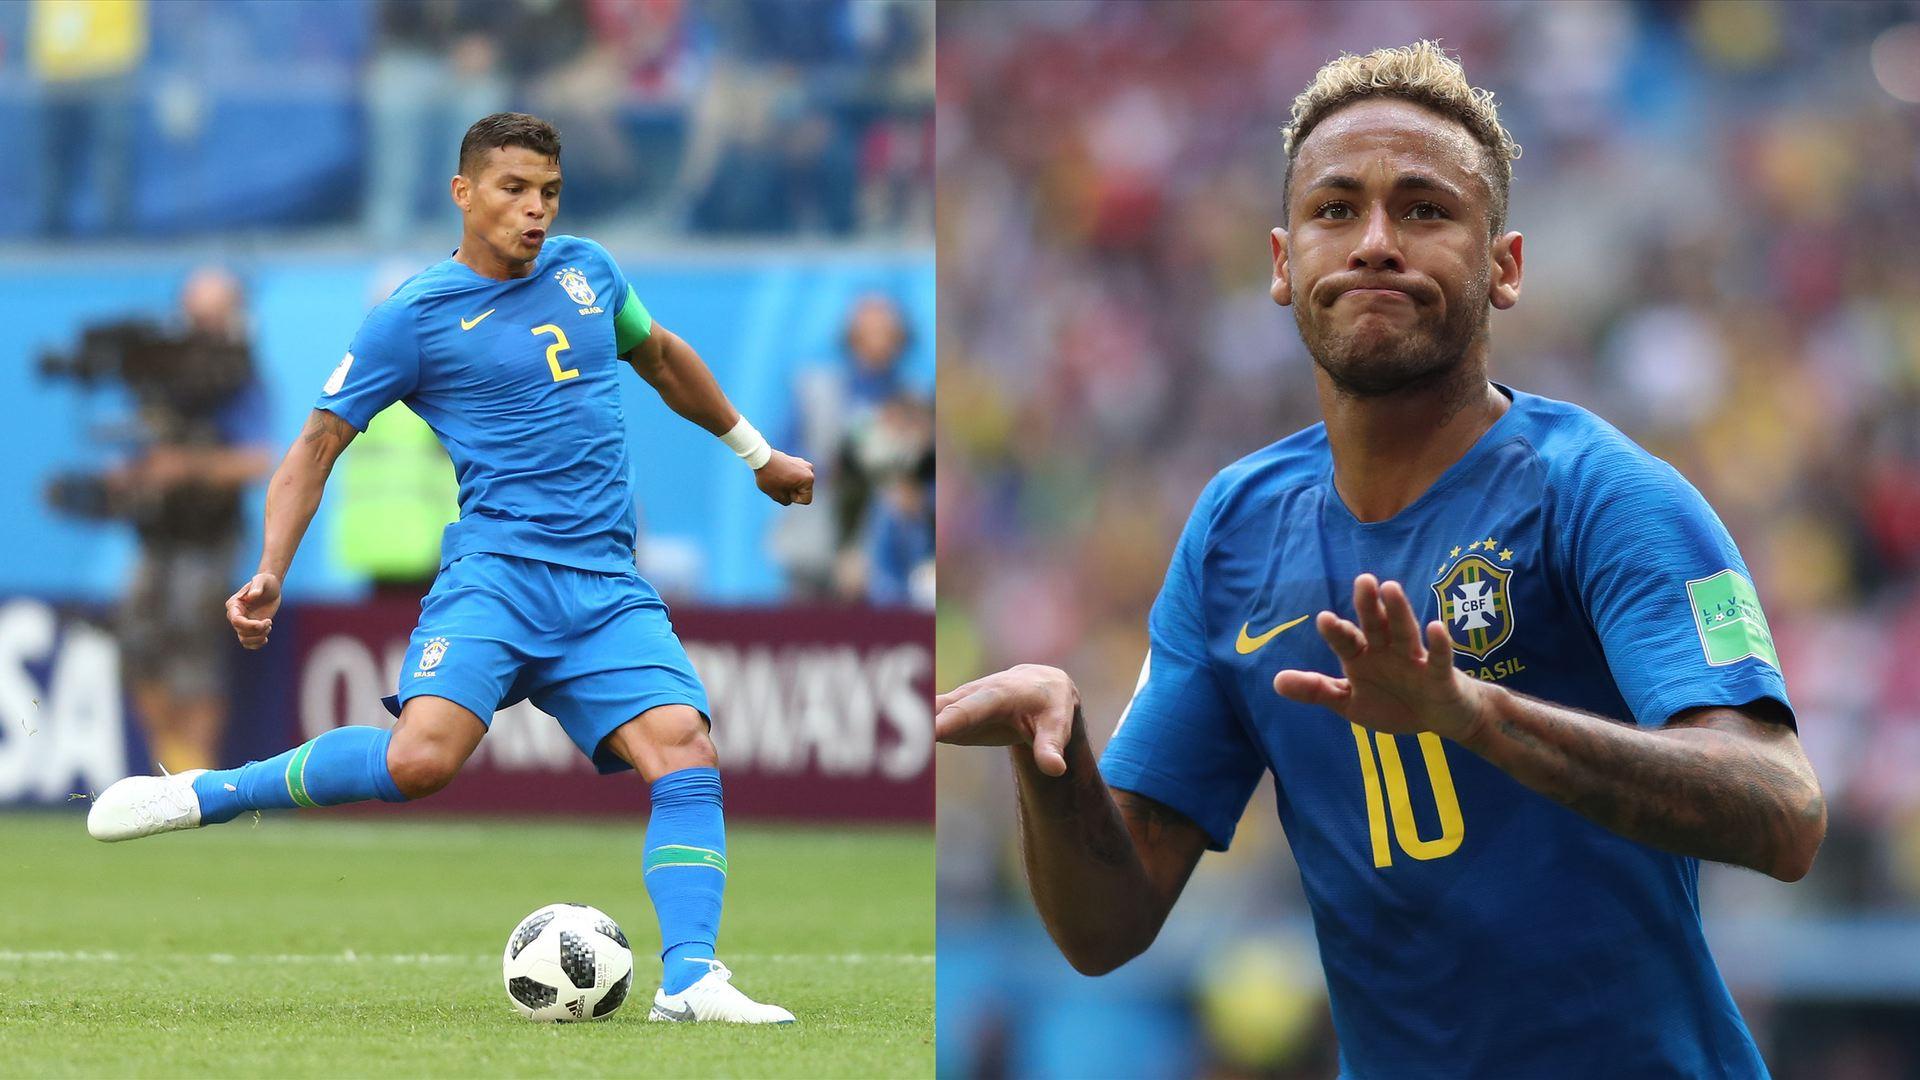 Neymar xingou Thiago Silva durante jogo do Brasil